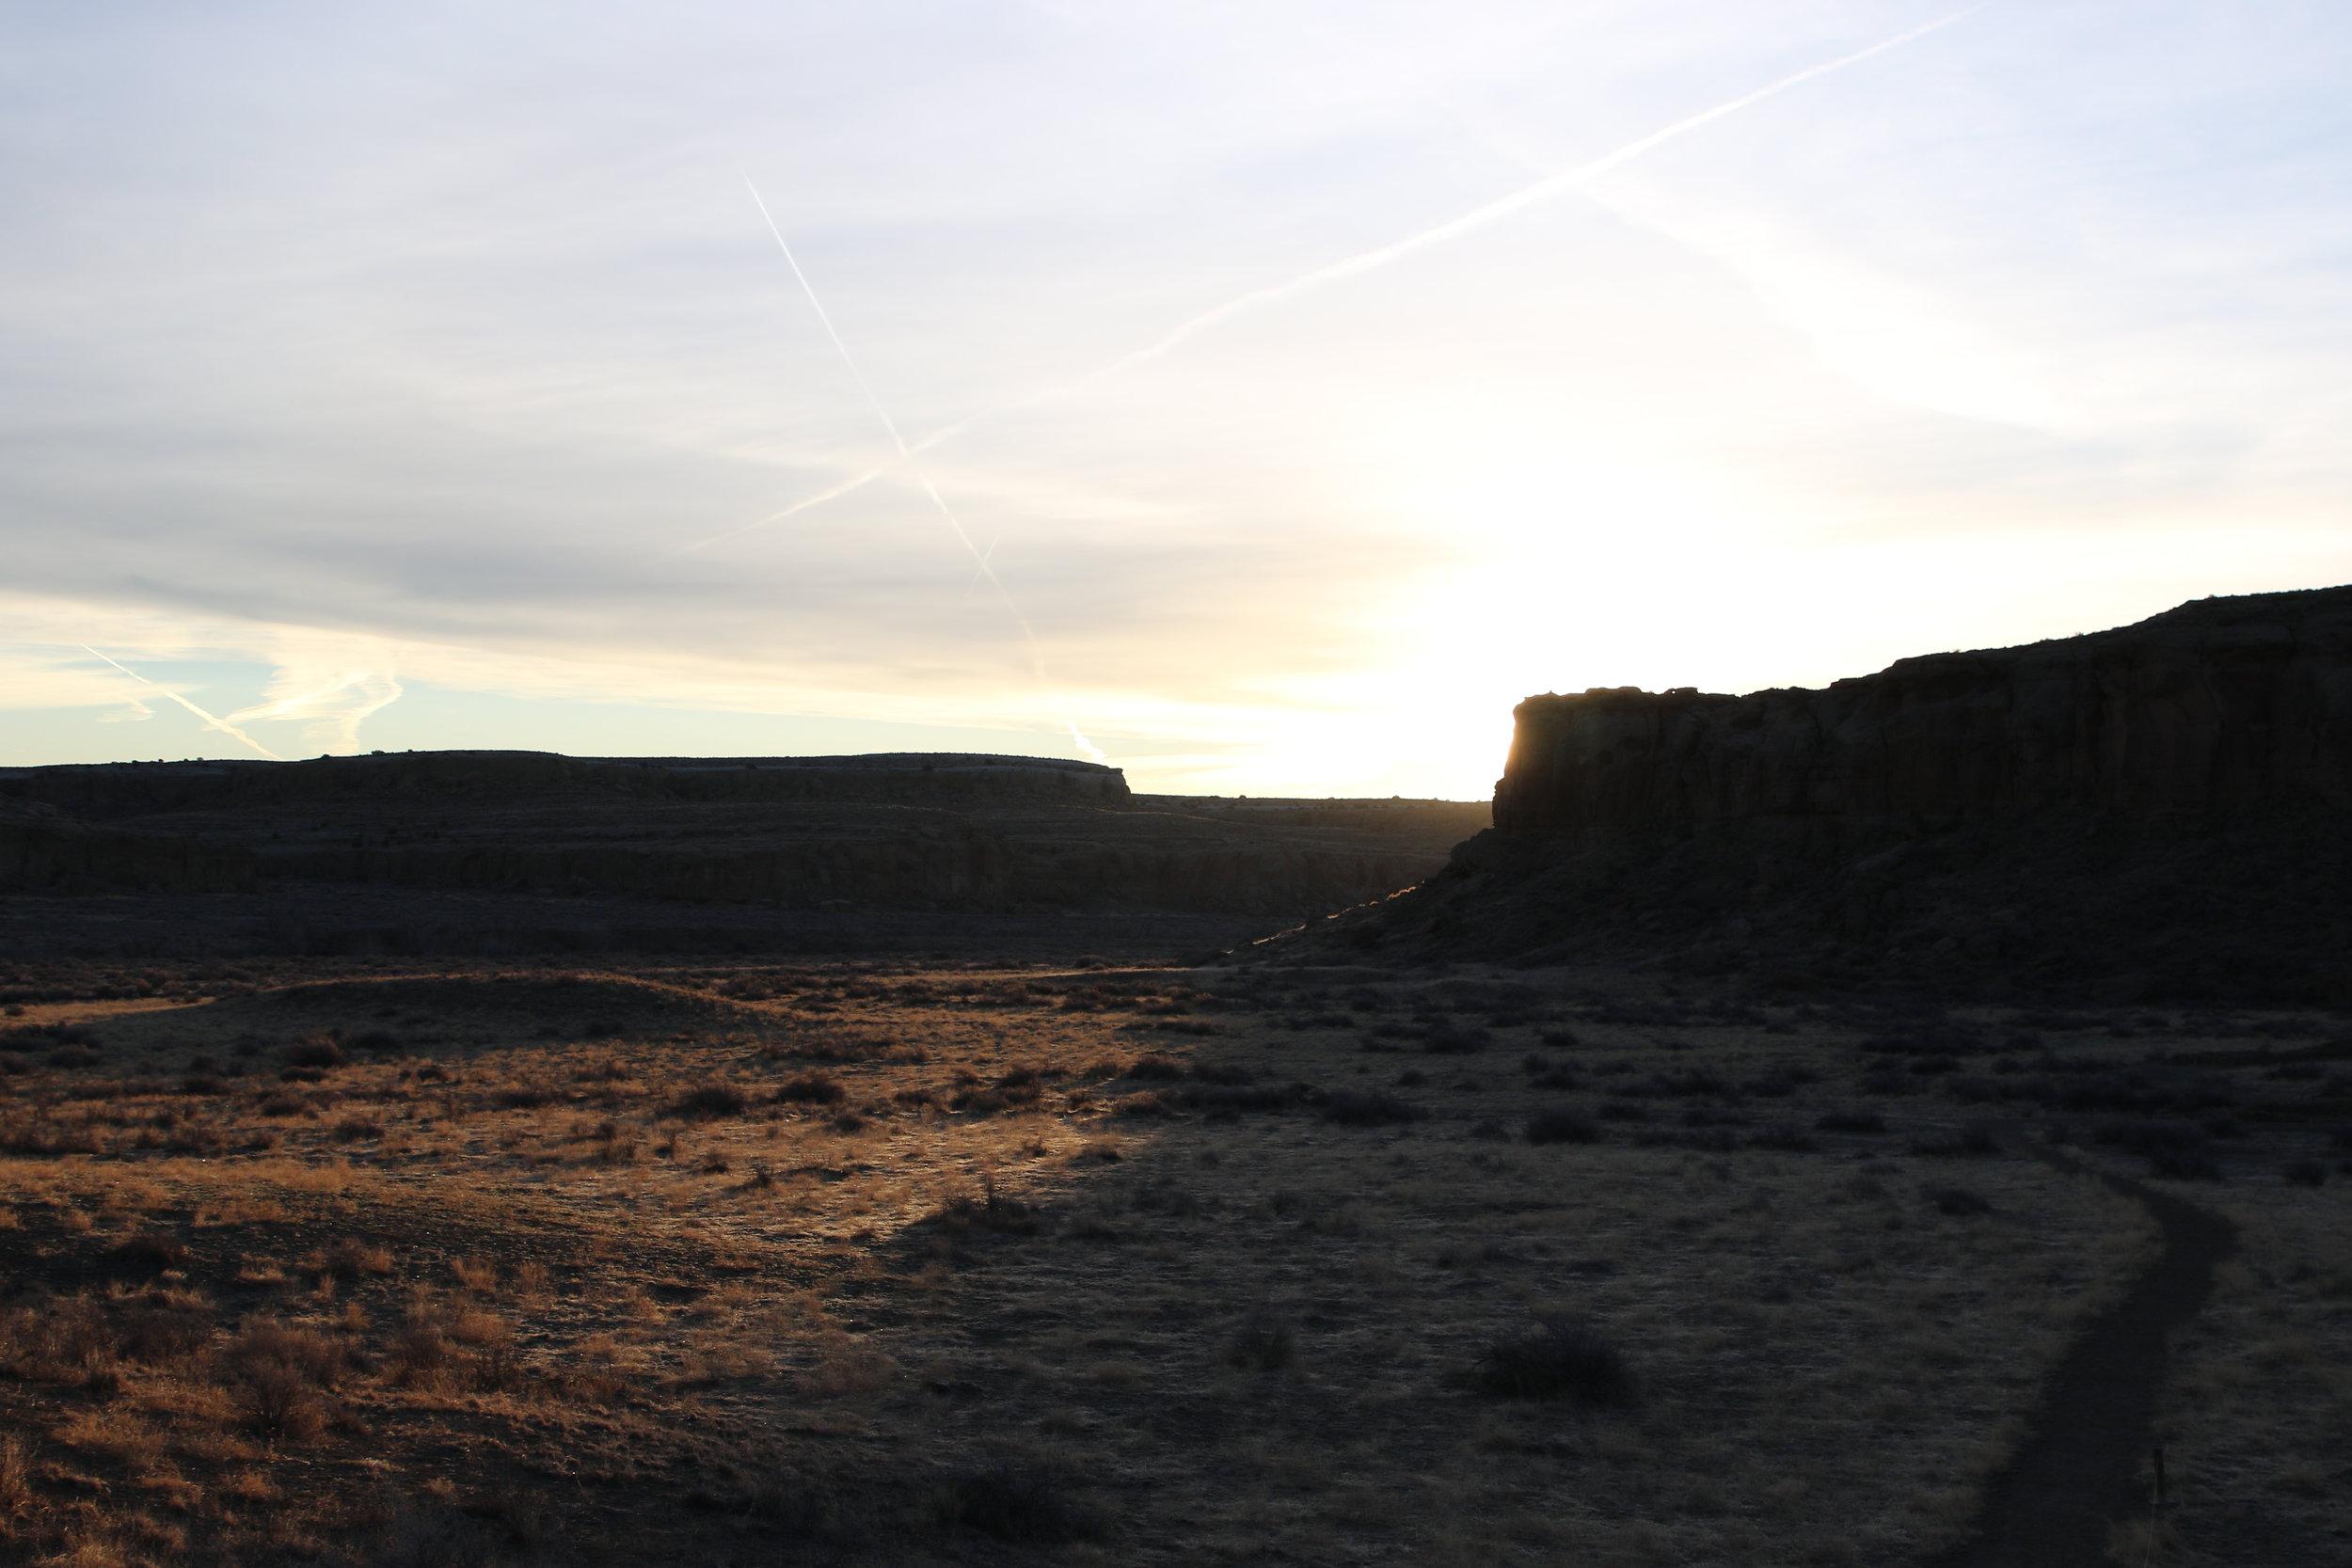 sunrise at chaco - rebecca mir grady